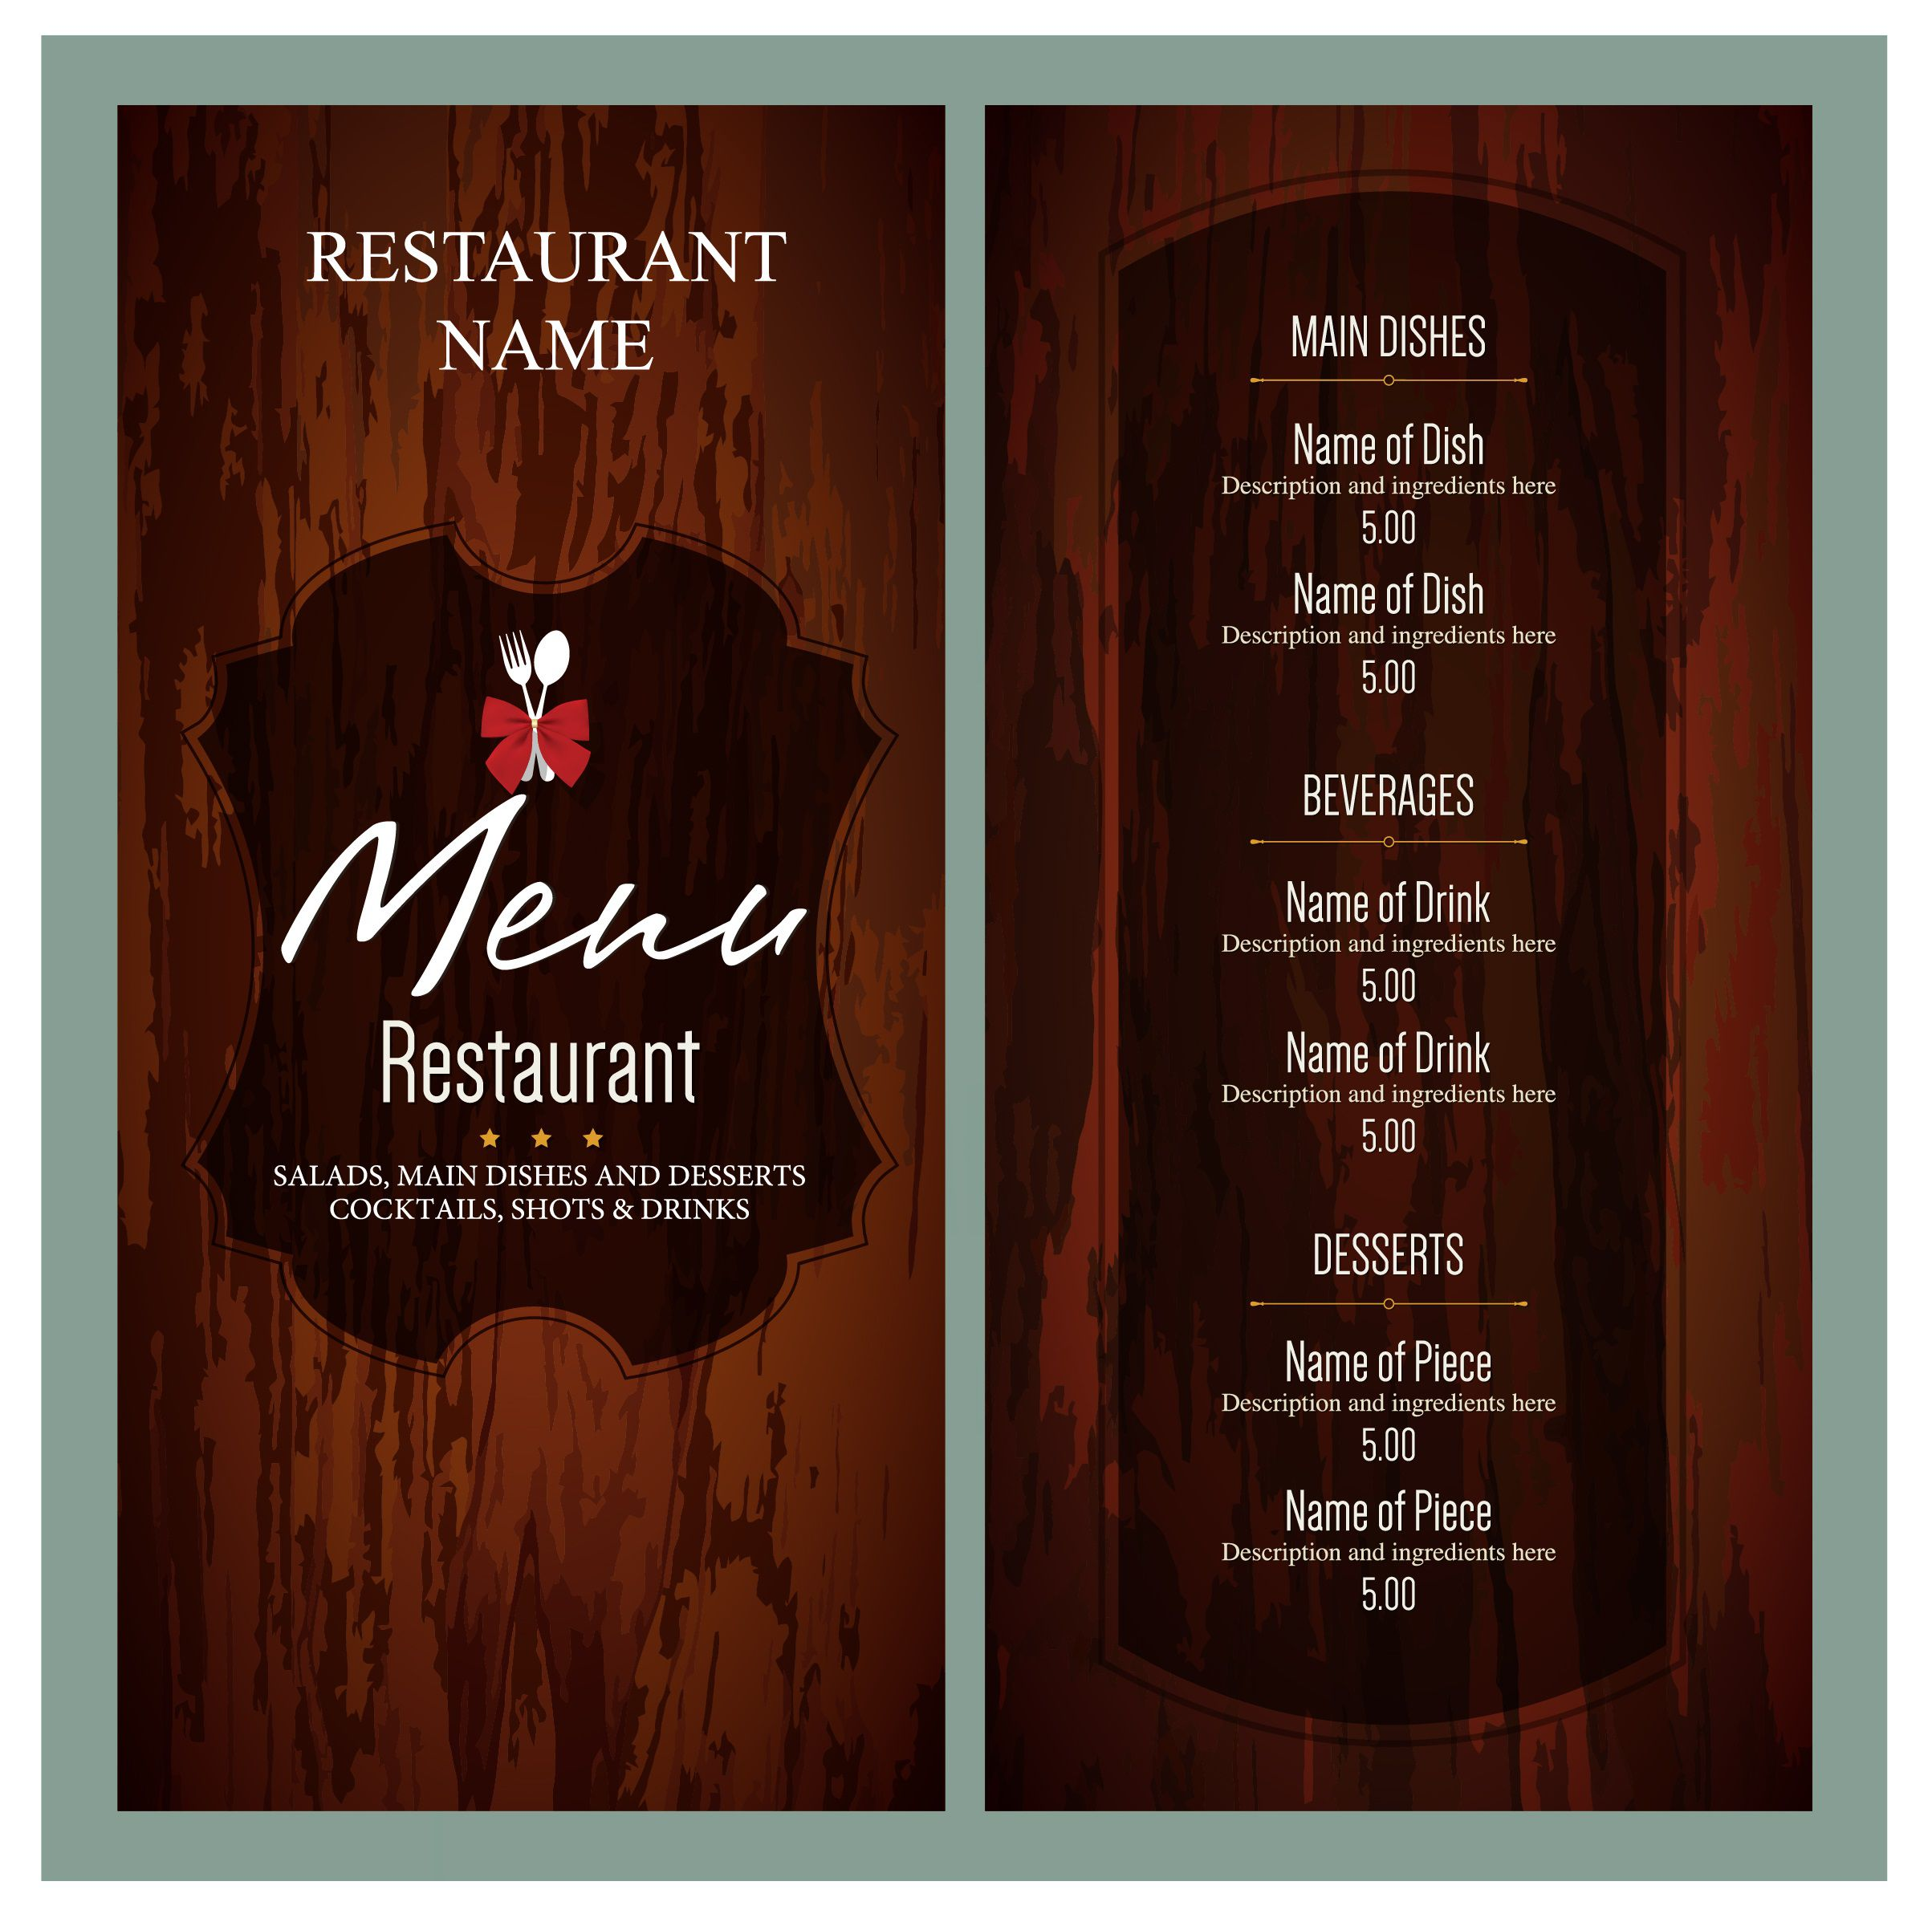 010 Unusual Free Menu Template Download High Resolution  Beauty Parlour Card Html Design RestaurantFull